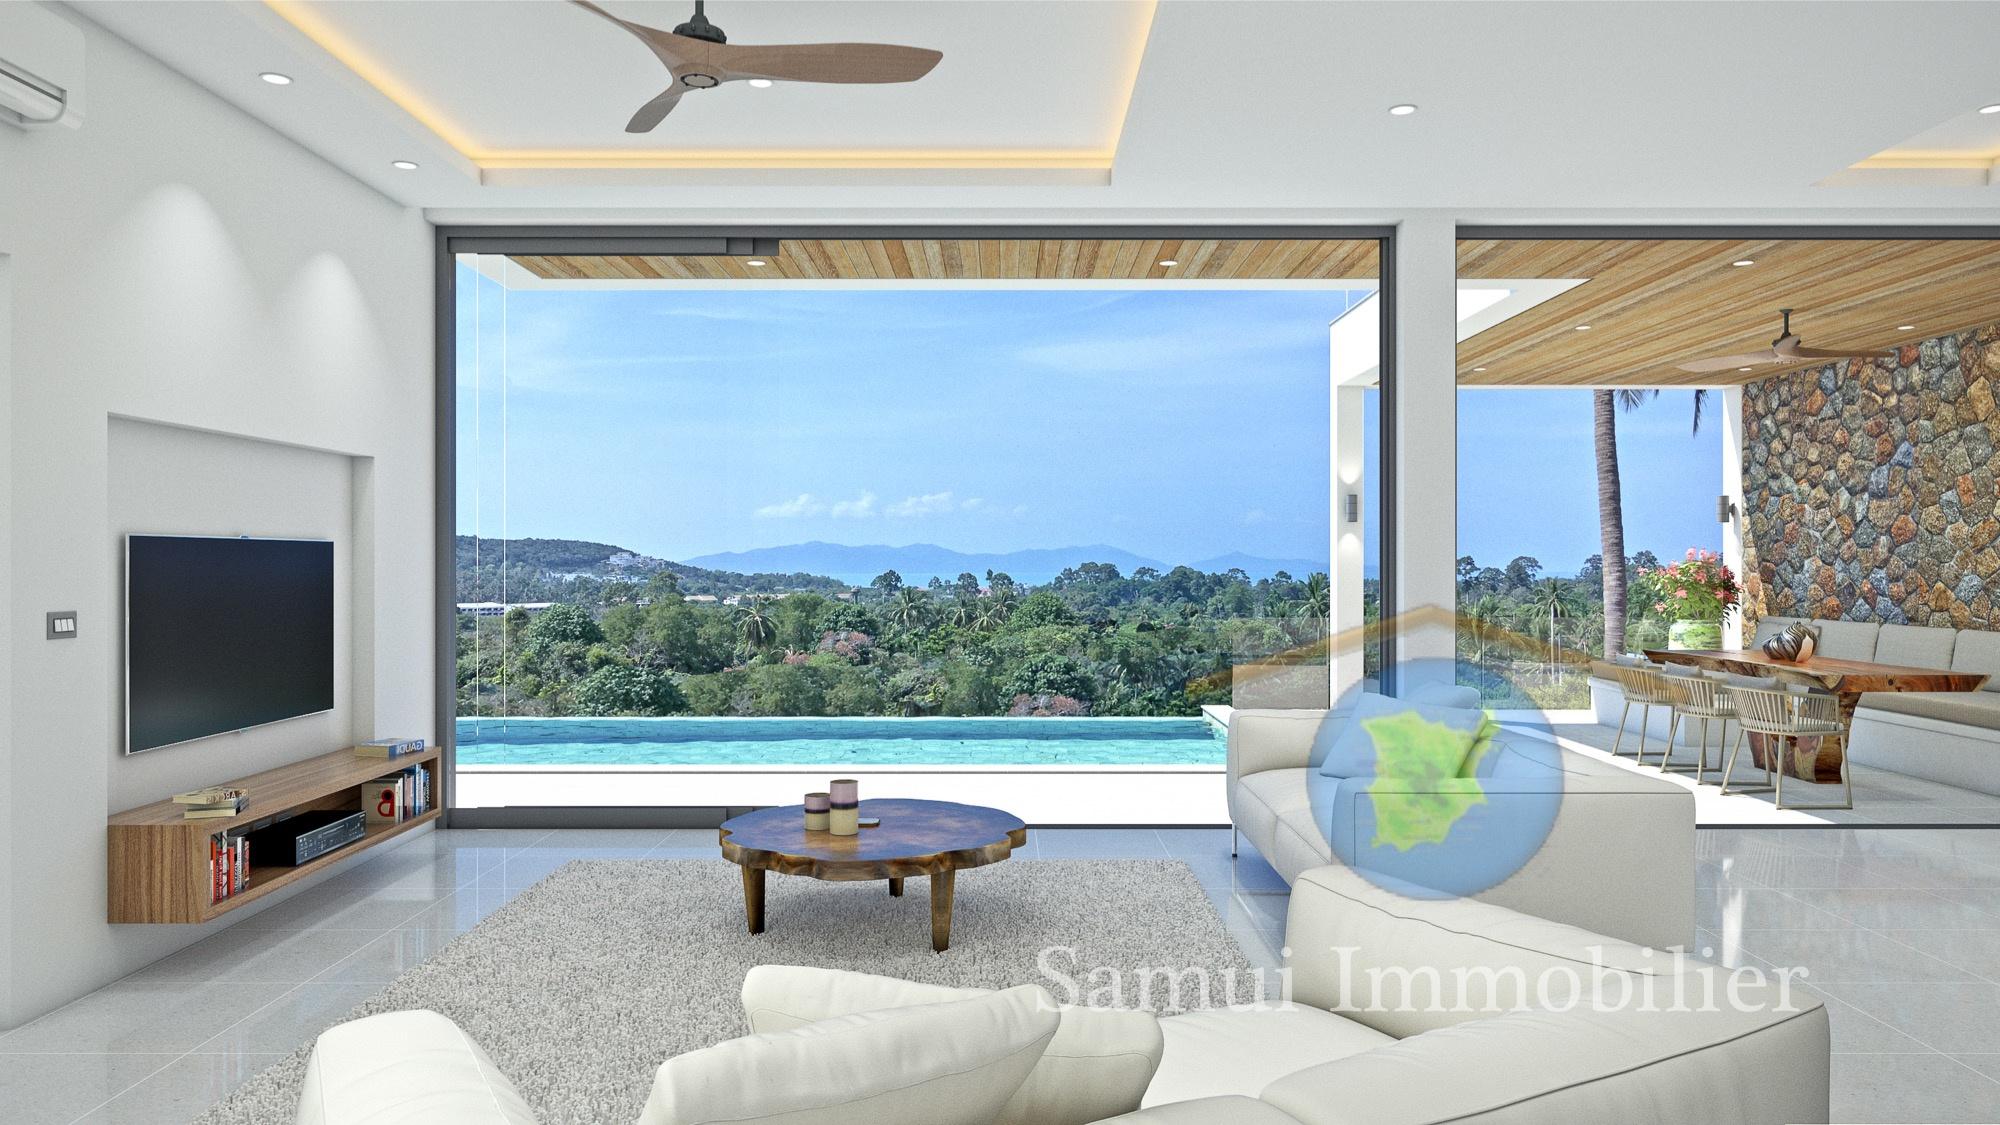 Villa for sale - 3 bedrooms - sea view - Bophut